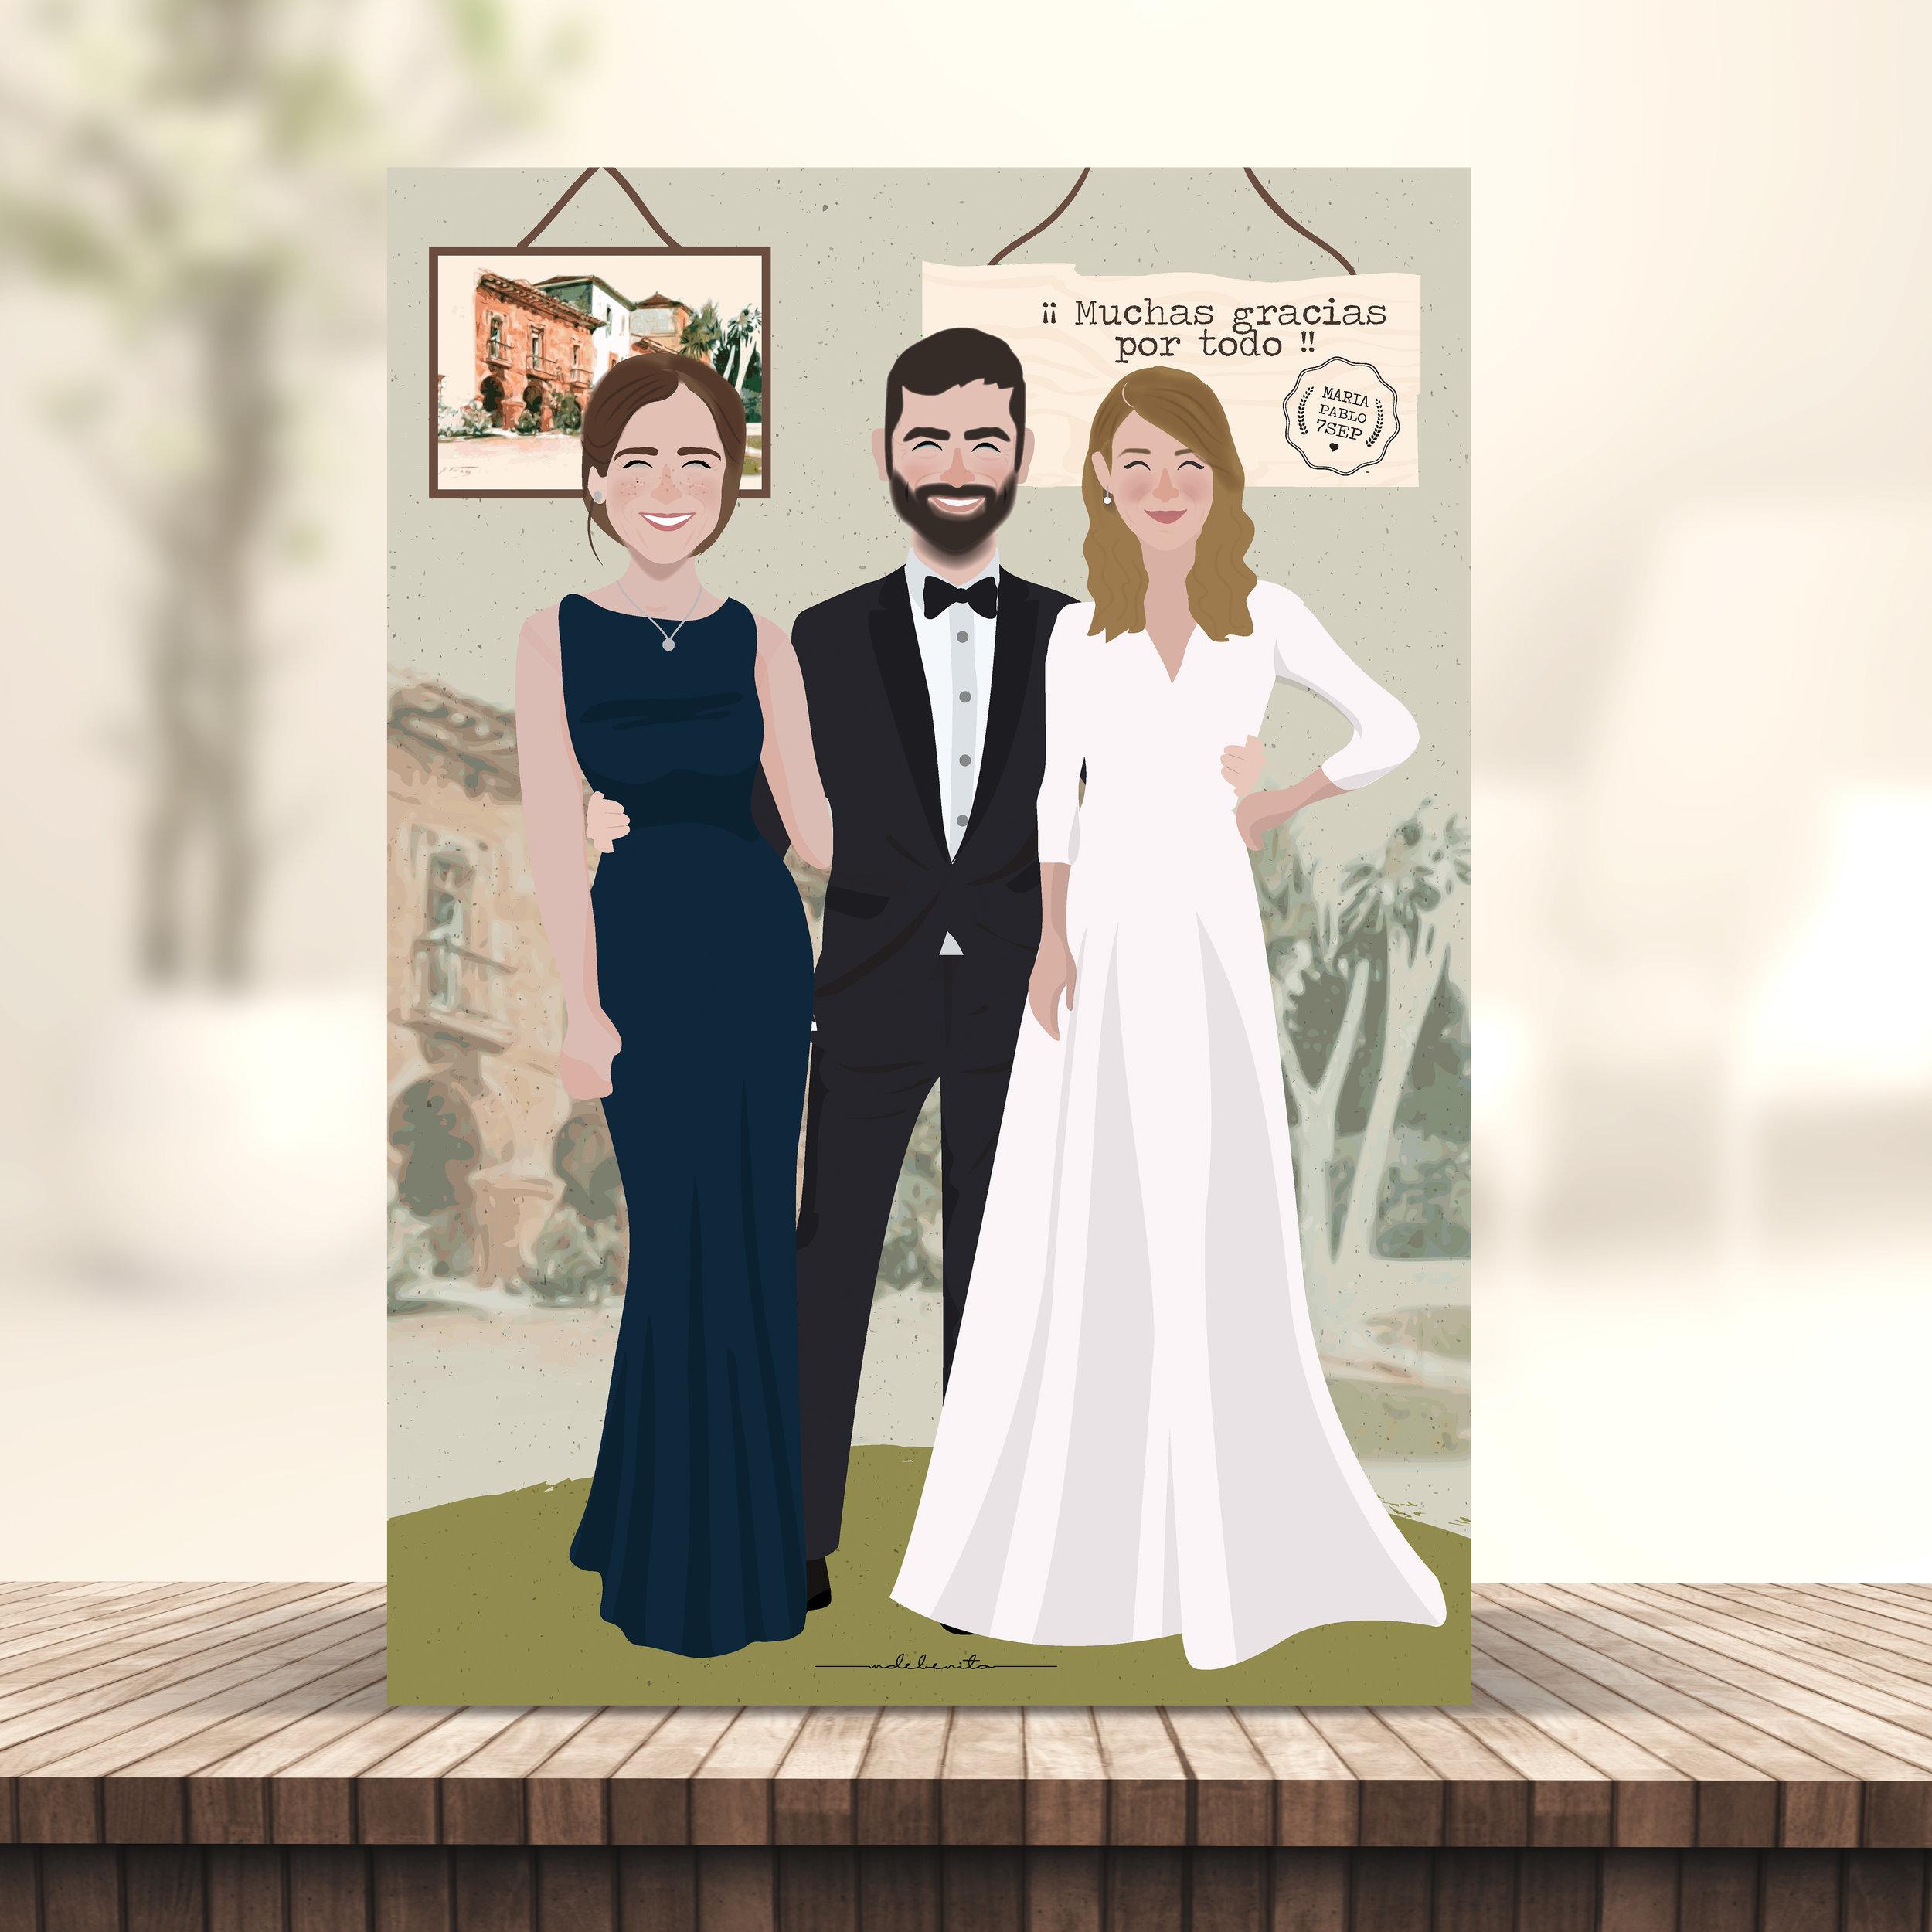 ilustracion-mdebenito-boda-palaciodemeres-asturias-ilustracionpersonaliada-novios.jpg